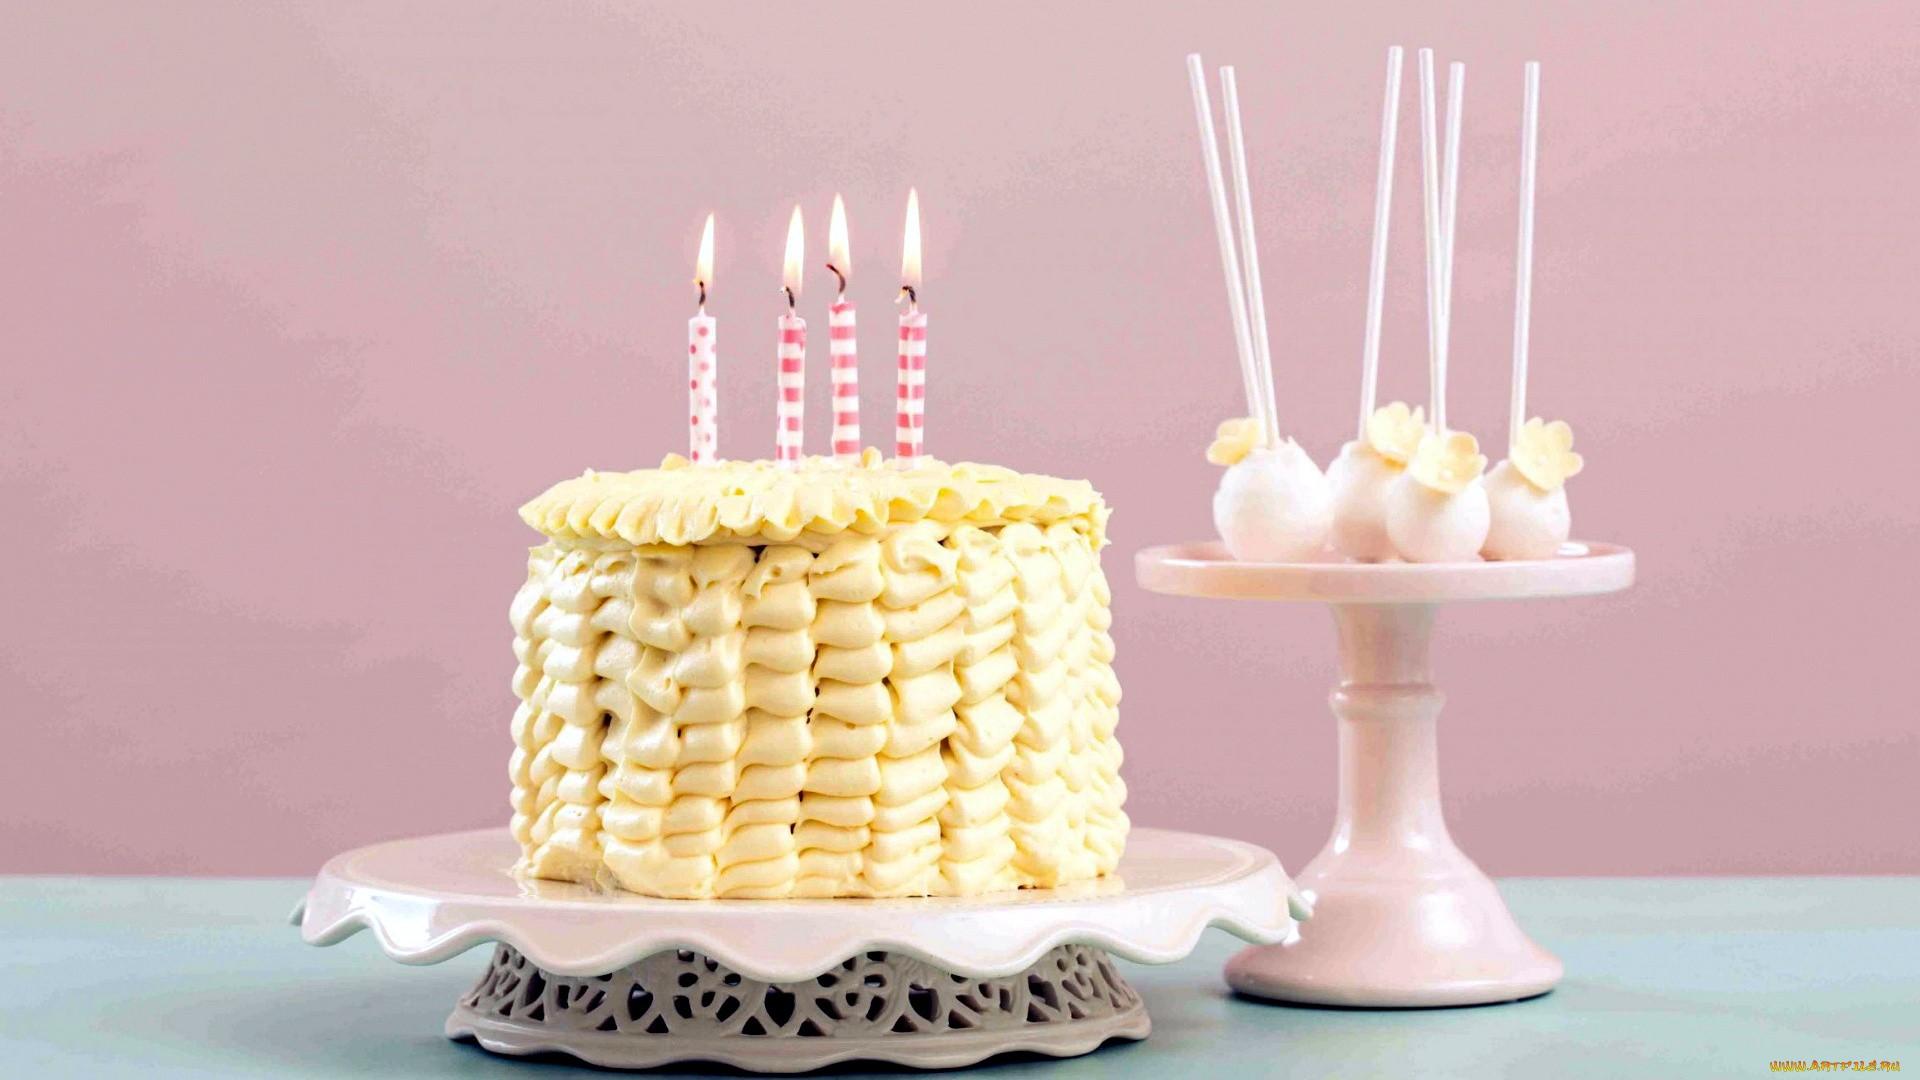 Birthday Cake 1080p background